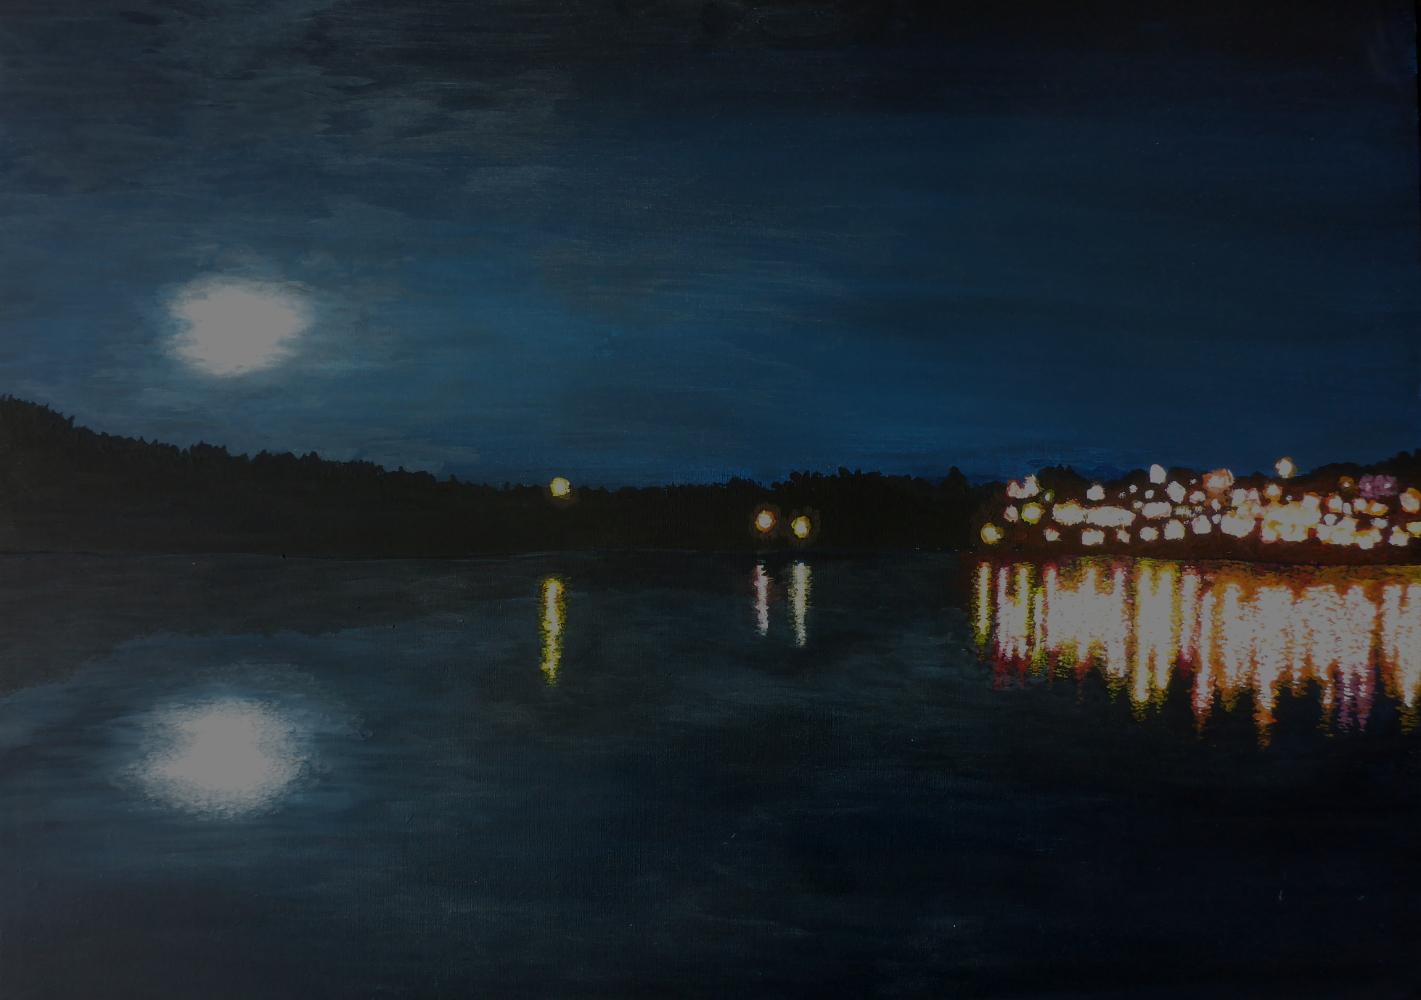 """Nanaimo"", 2019, Acryl auf Pappe, 70 x 50 cm"